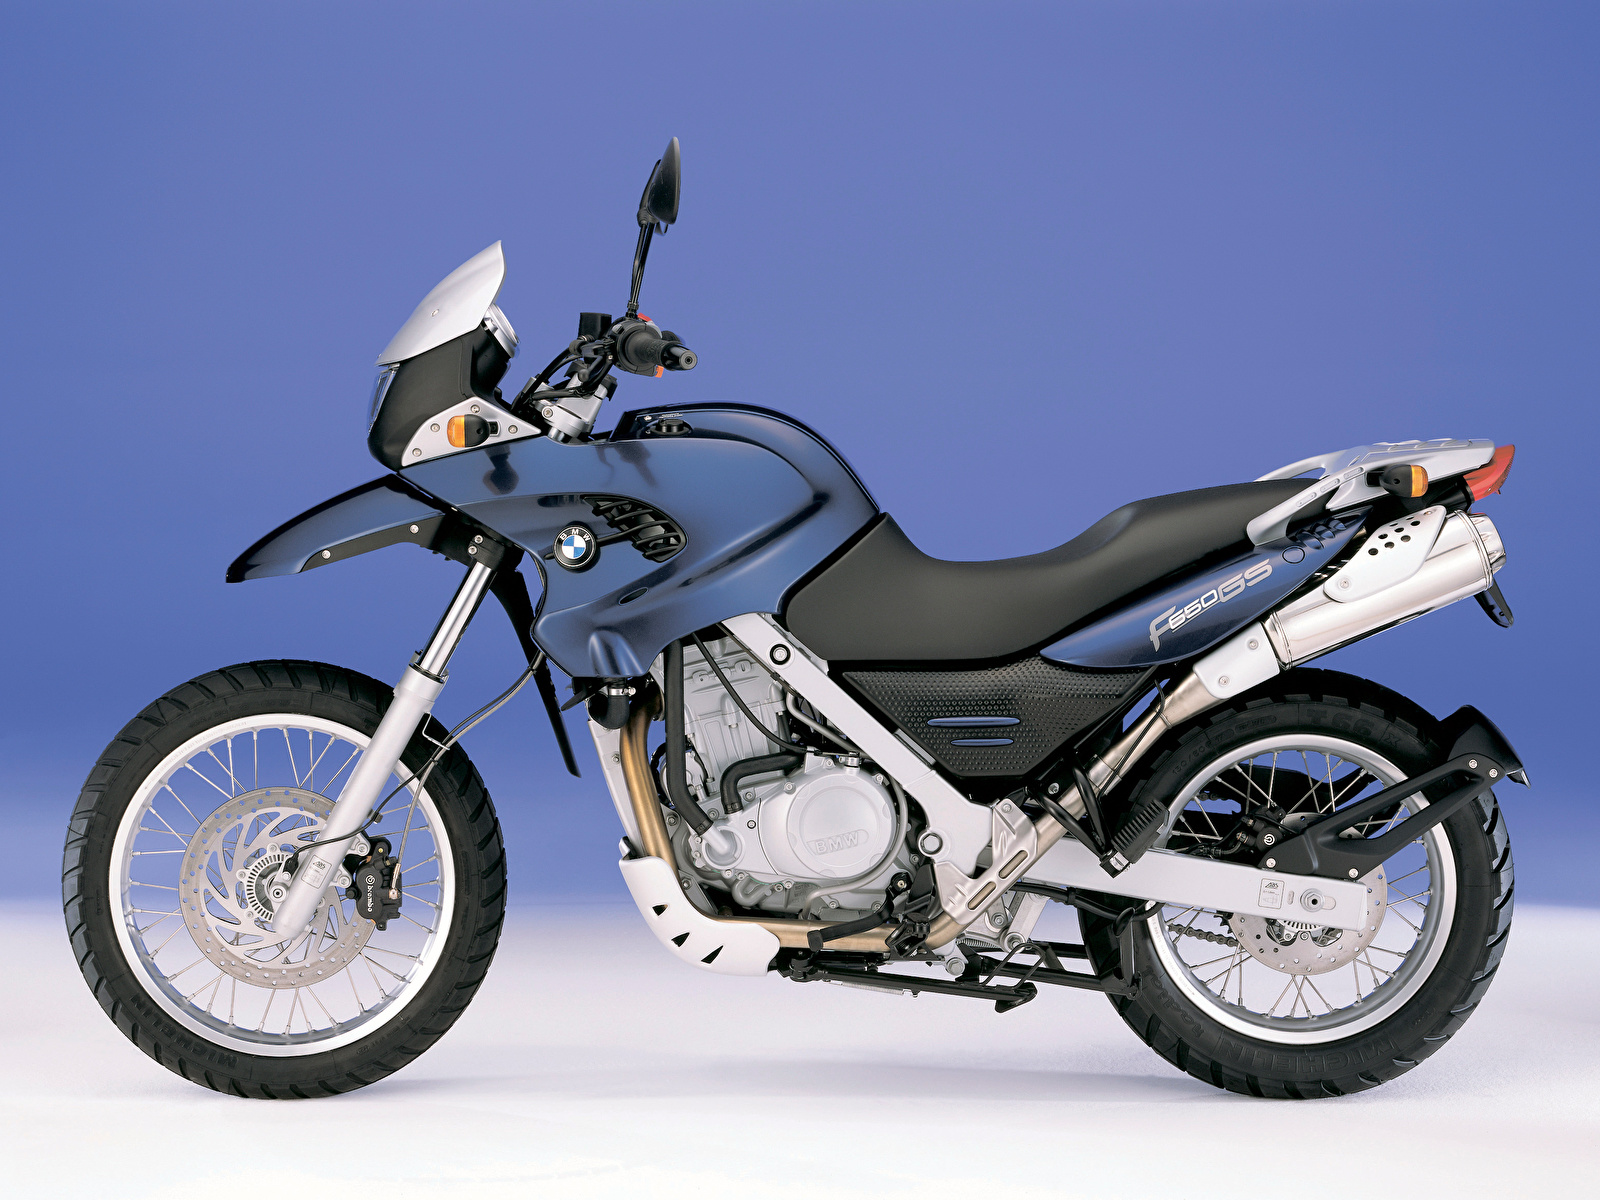 Фото БМВ F 650 GS (R13), 1999–2003 Мотоциклы Сбоку 1600x1200 BMW - Мотоциклы мотоцикл